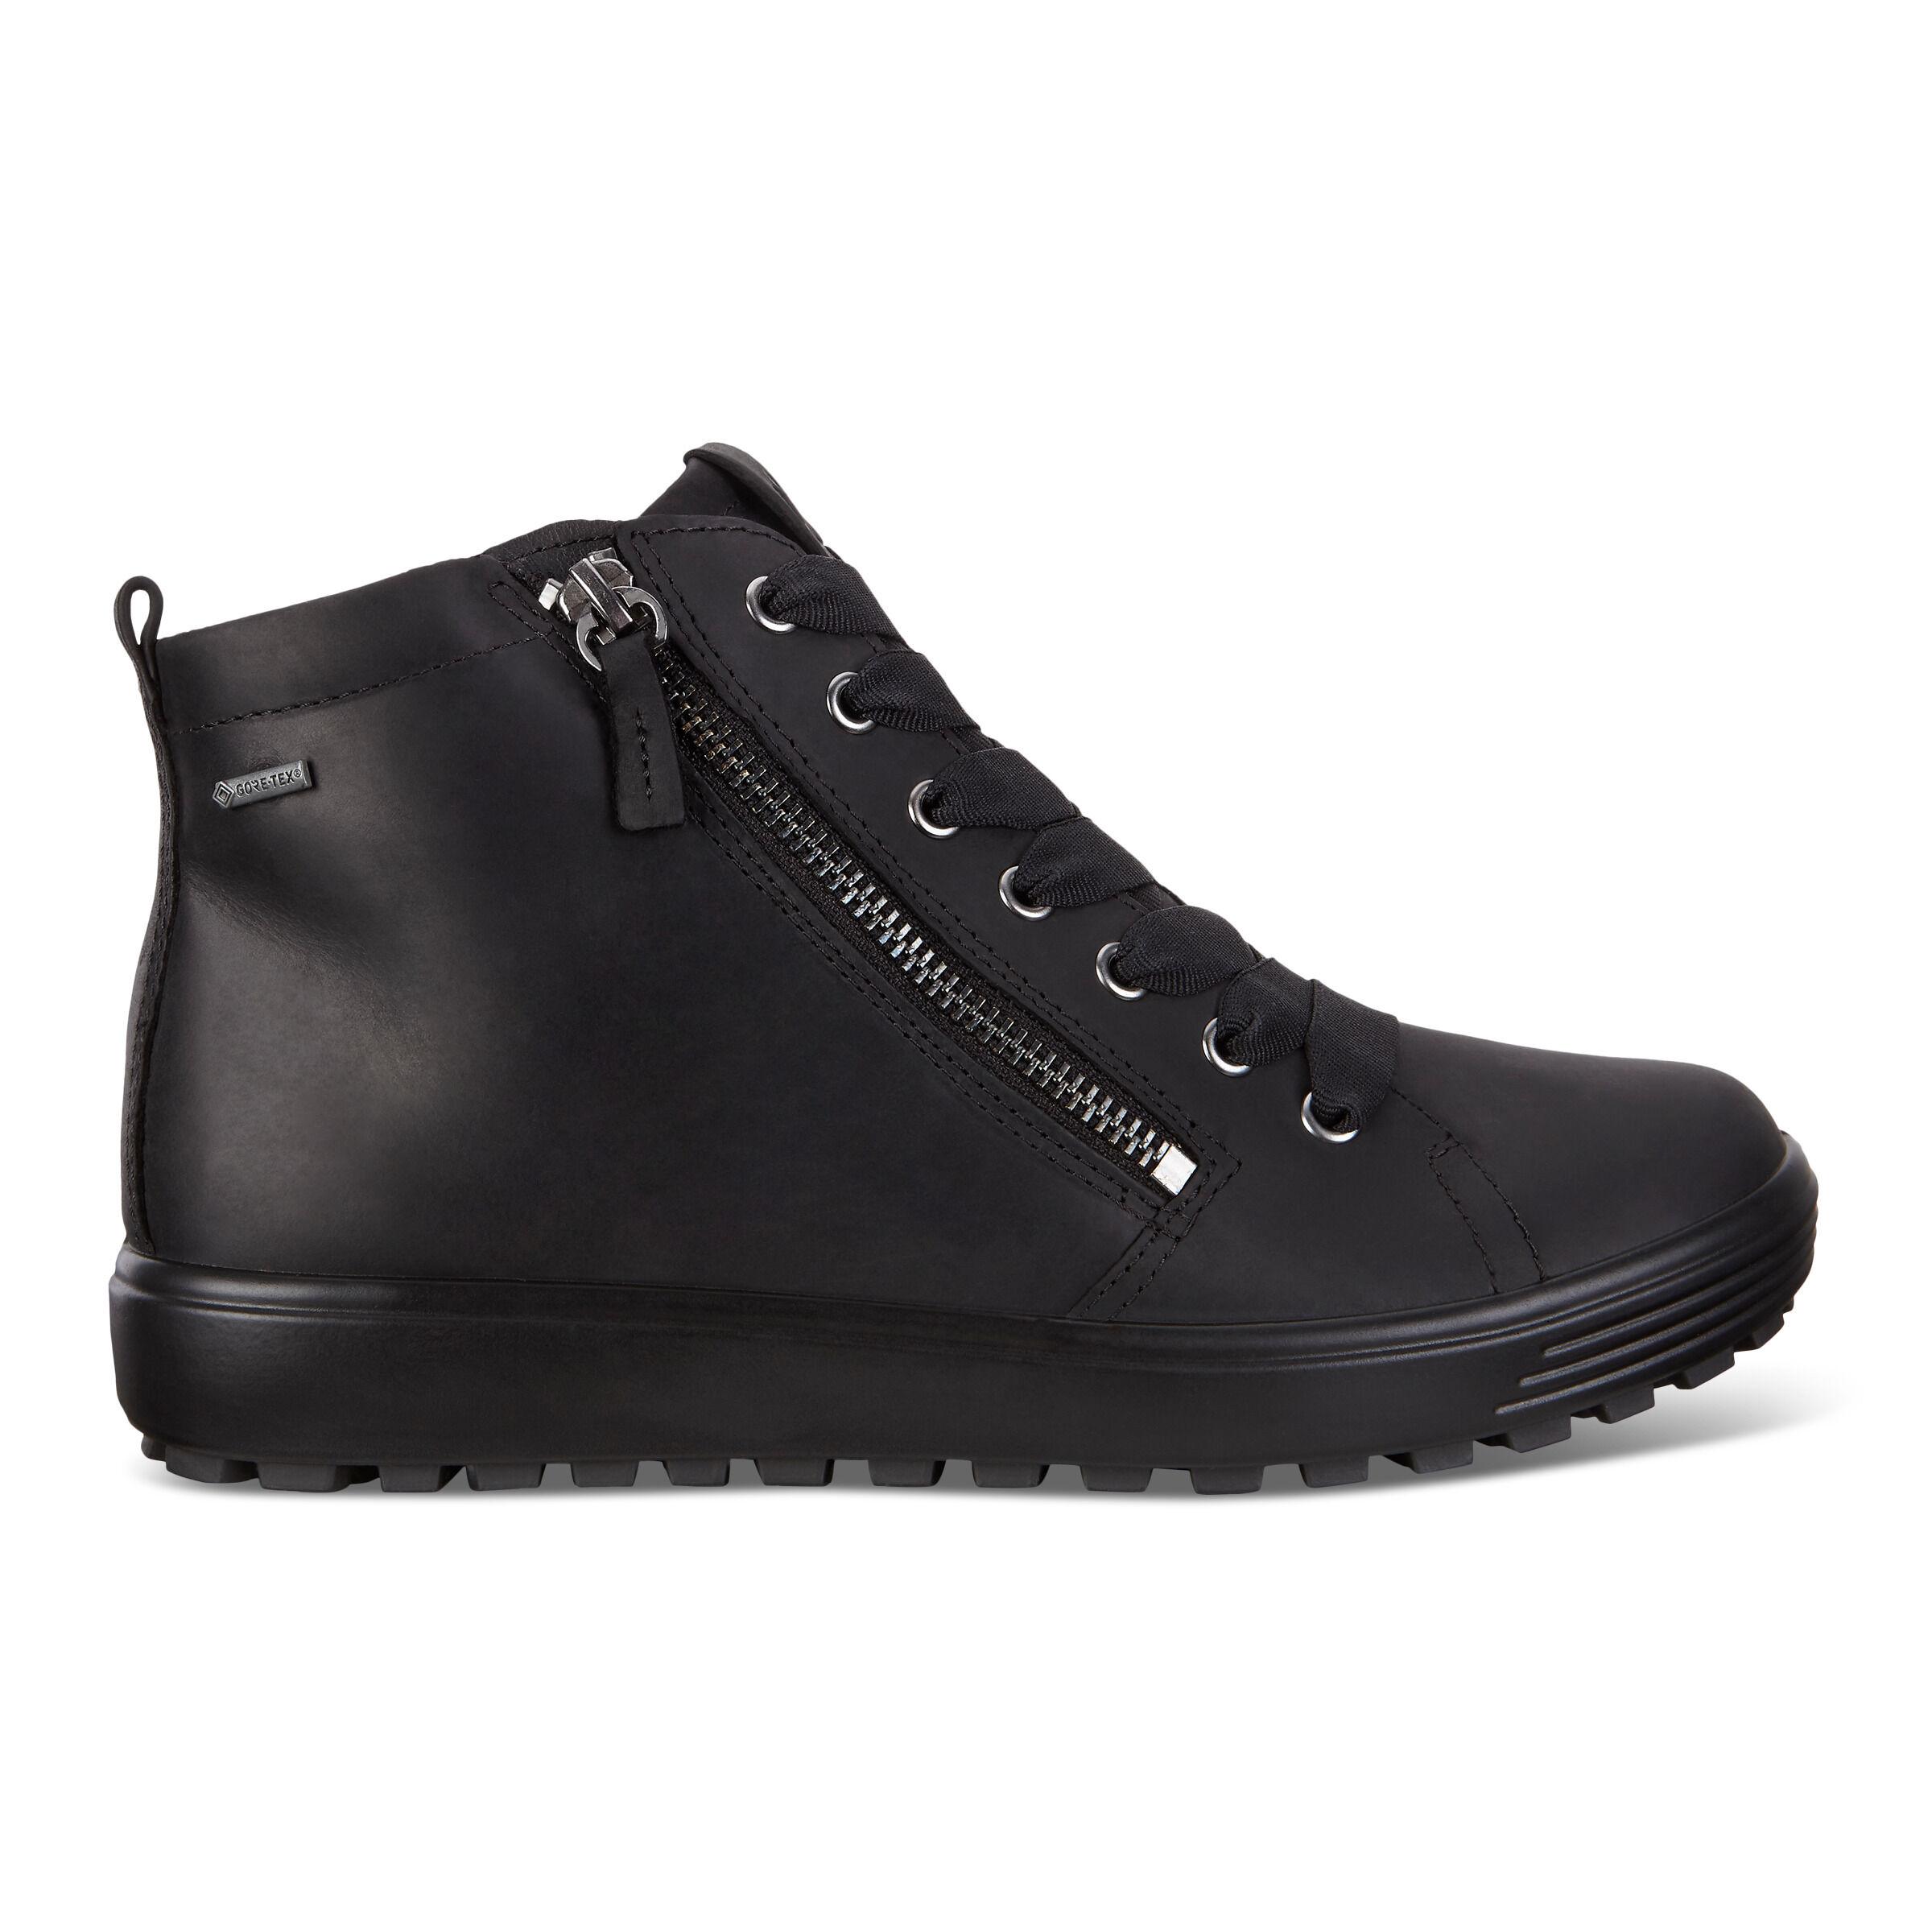 Women's Winter Boots | ECCO® Shoes